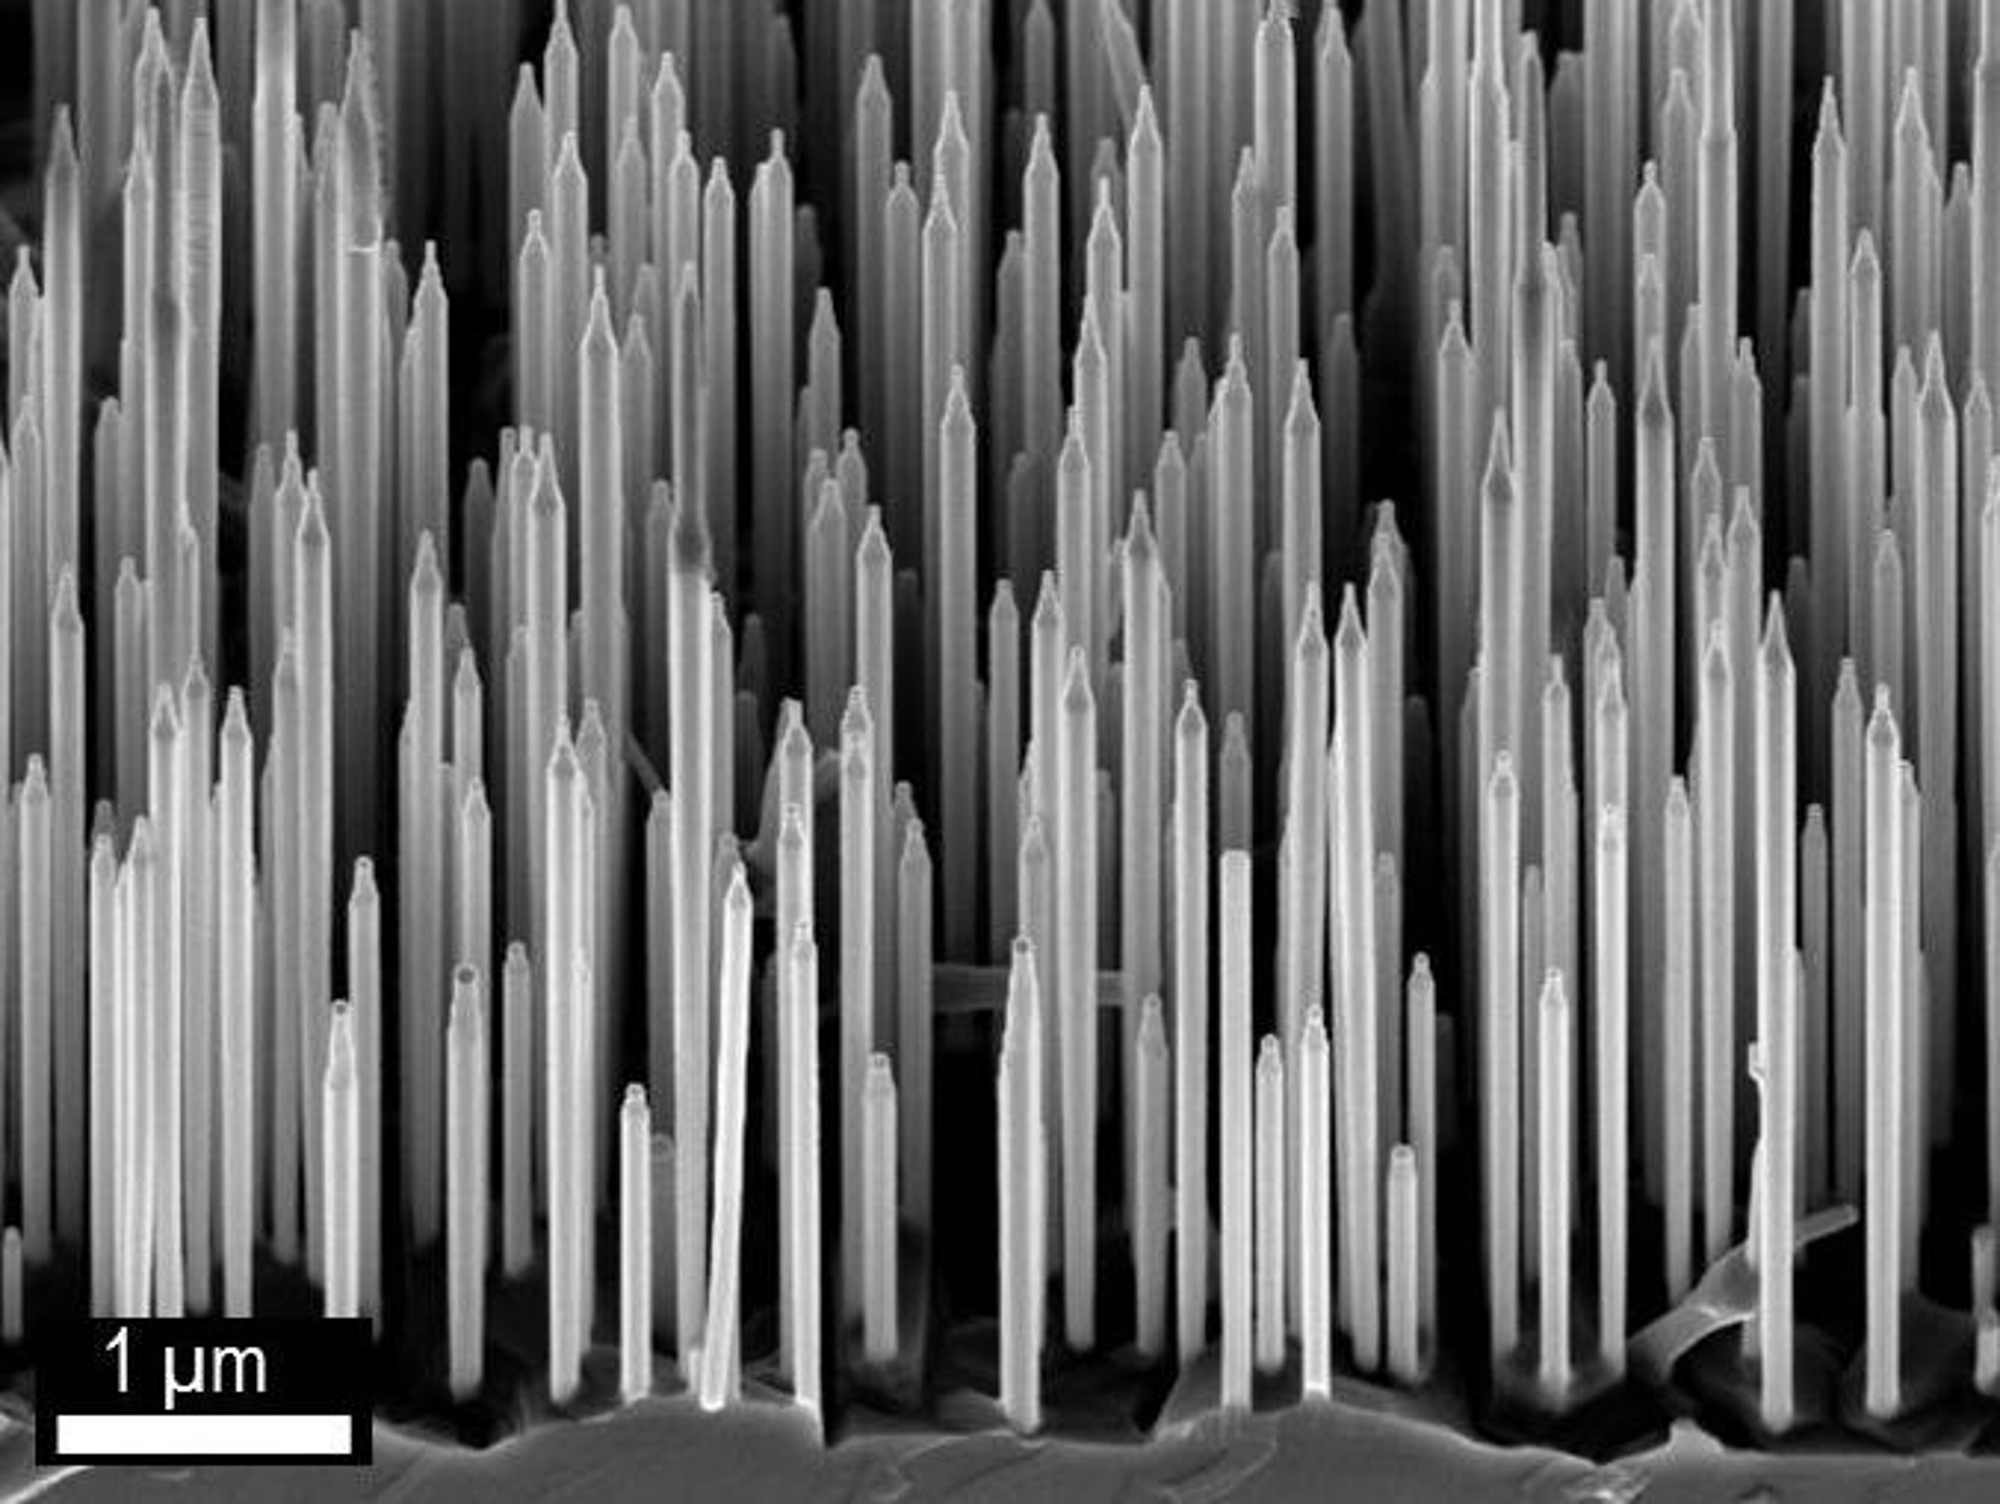 Elektronmikroskopi-bilde av wurtzite GaAs / AlGaAs nanotråder.